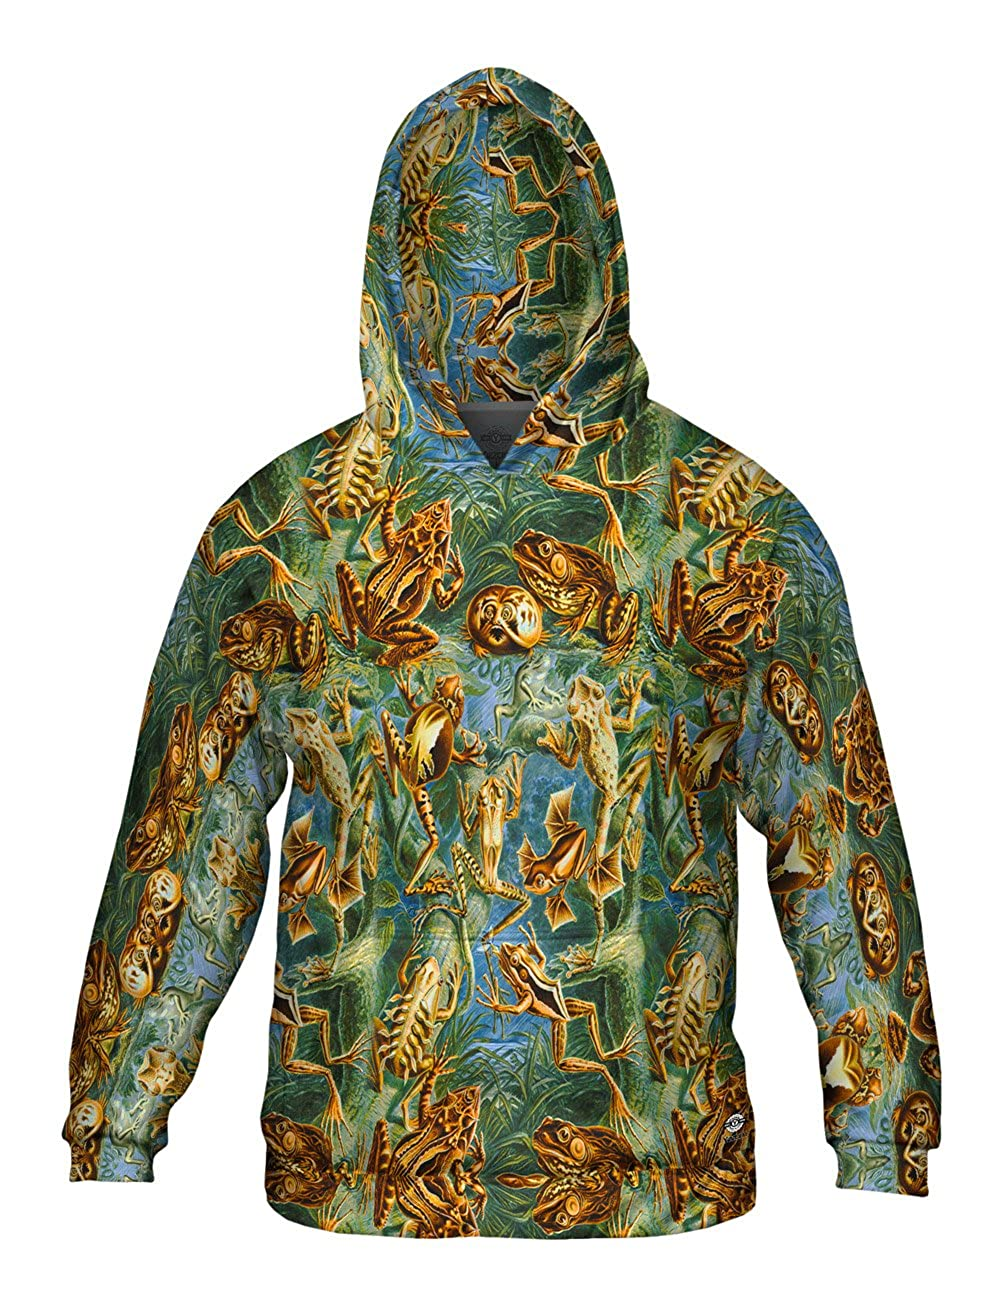 -Allover Print Mens Hoodie 1904 Batrachia Yizzam- Ernst Haeckel